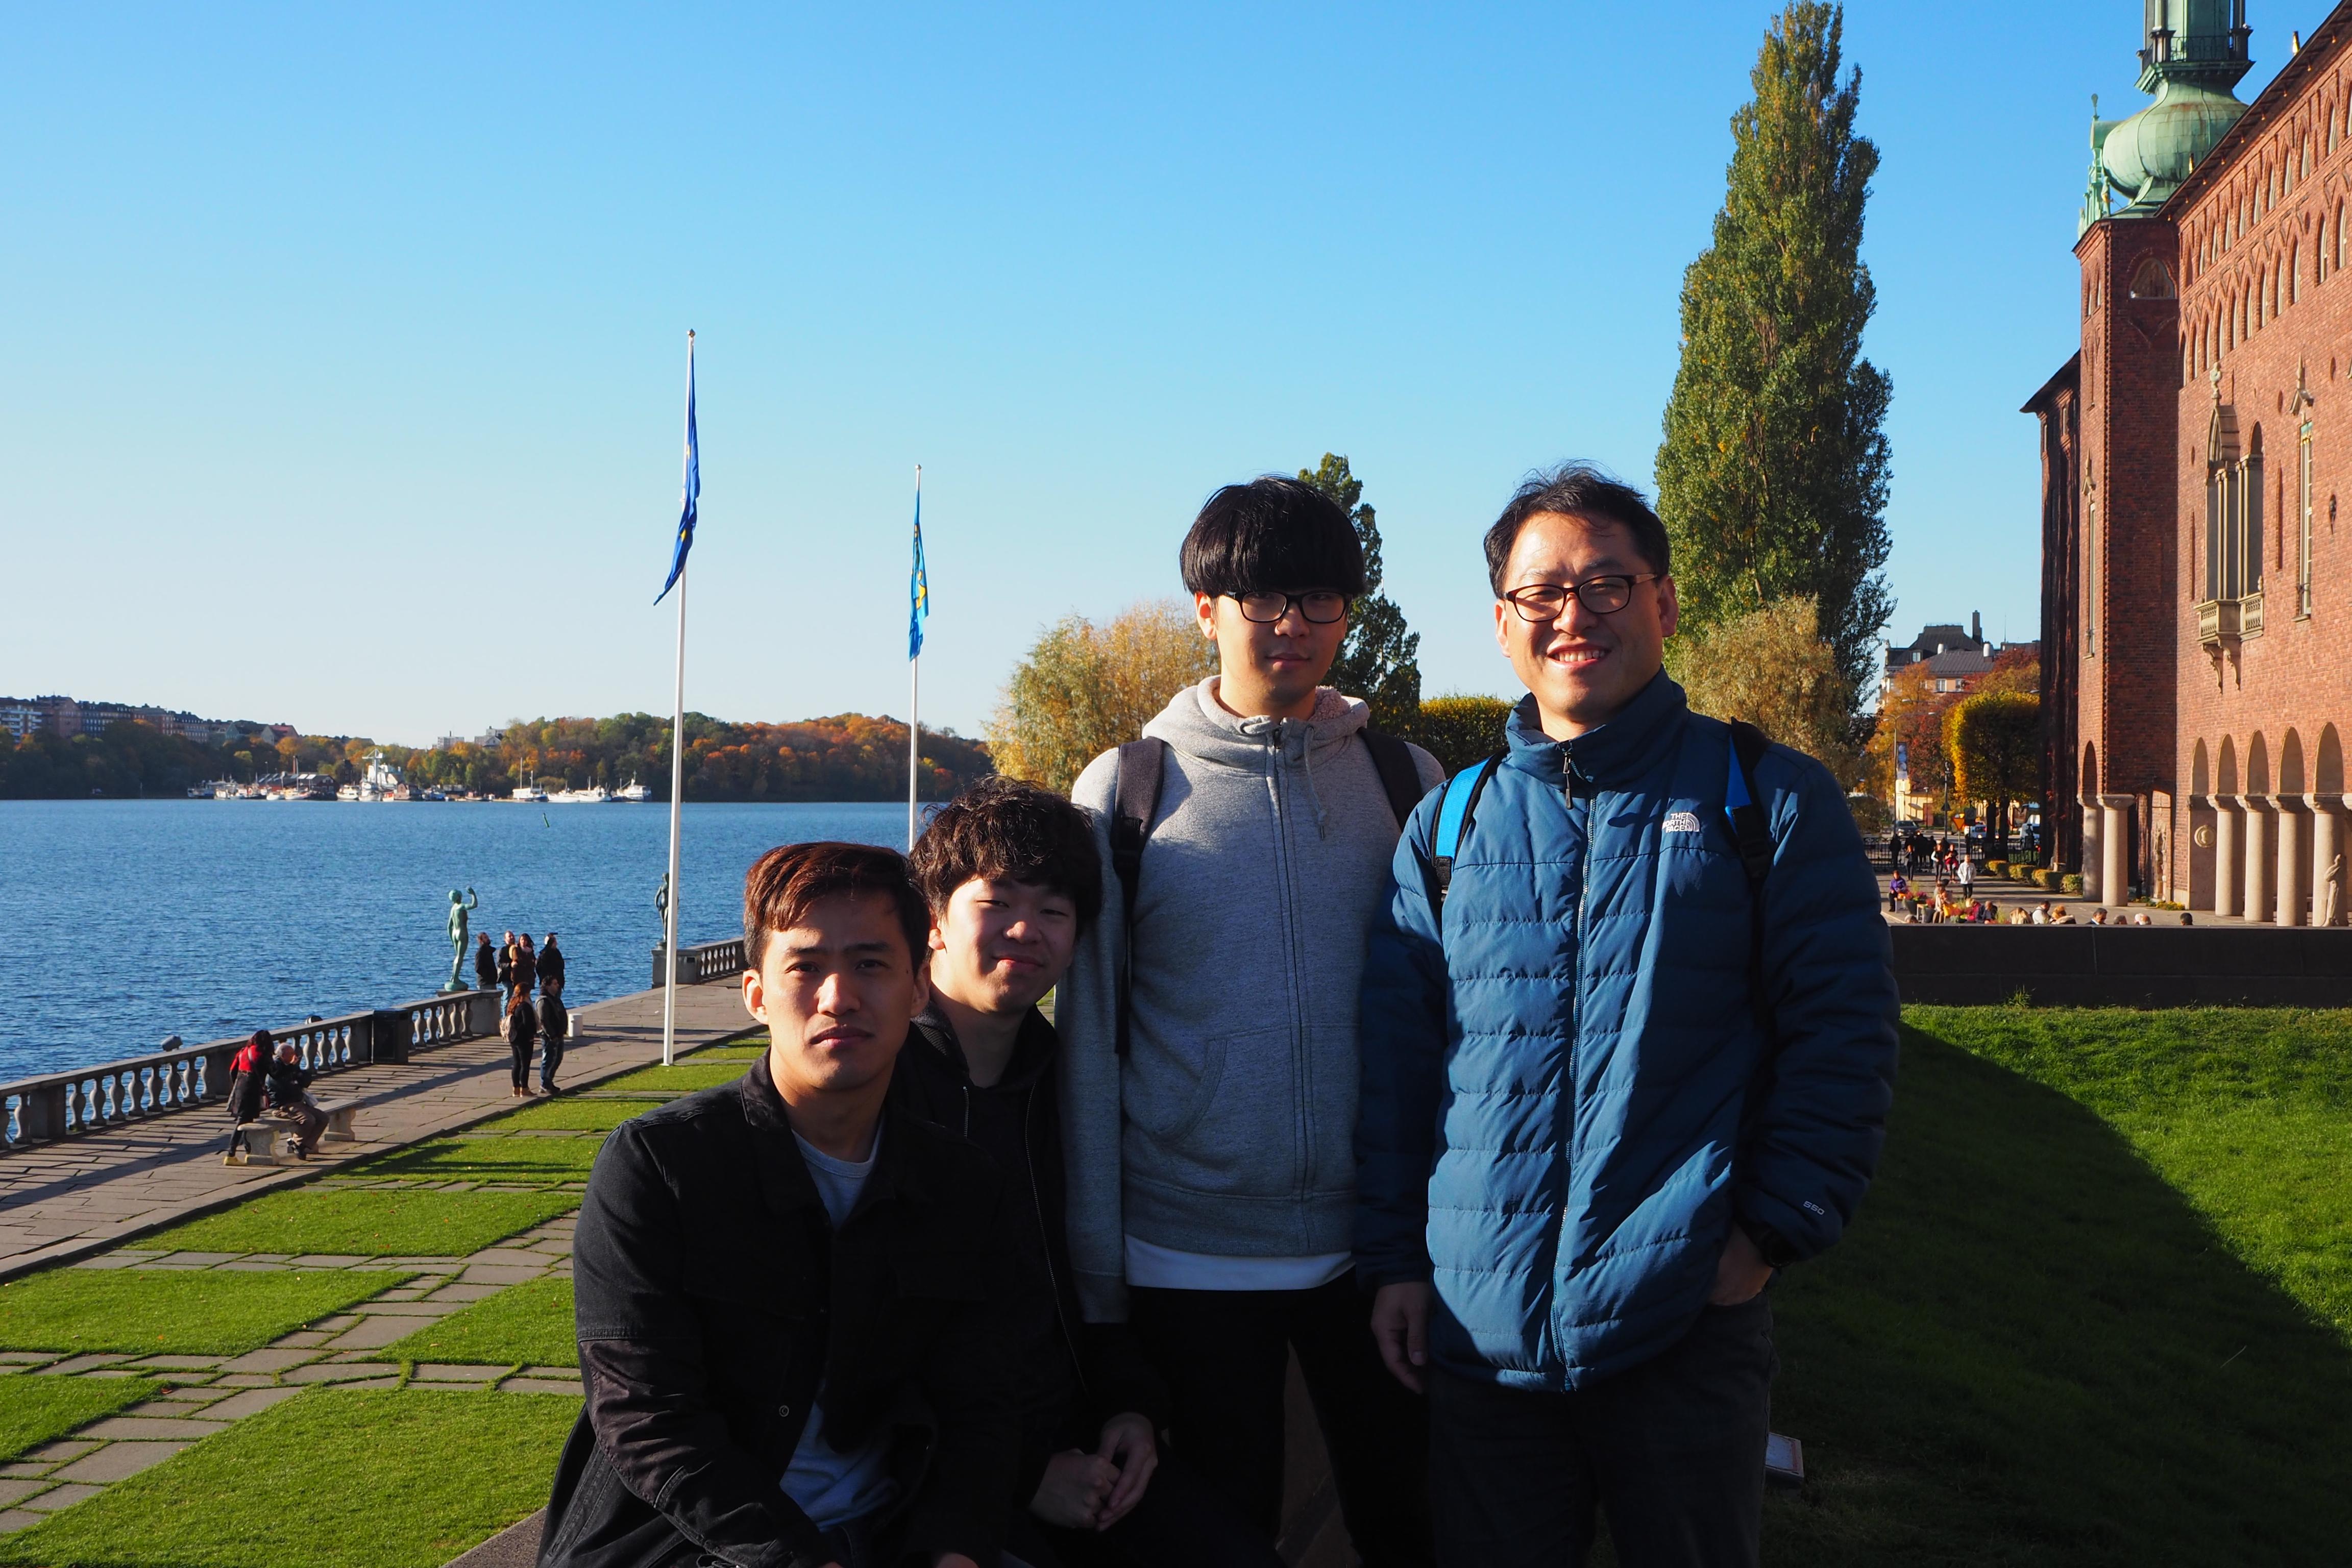 The 1st Dyenamo DSSC Conference 16-17 October 2017, Uppsala and Stockholm, Sweden